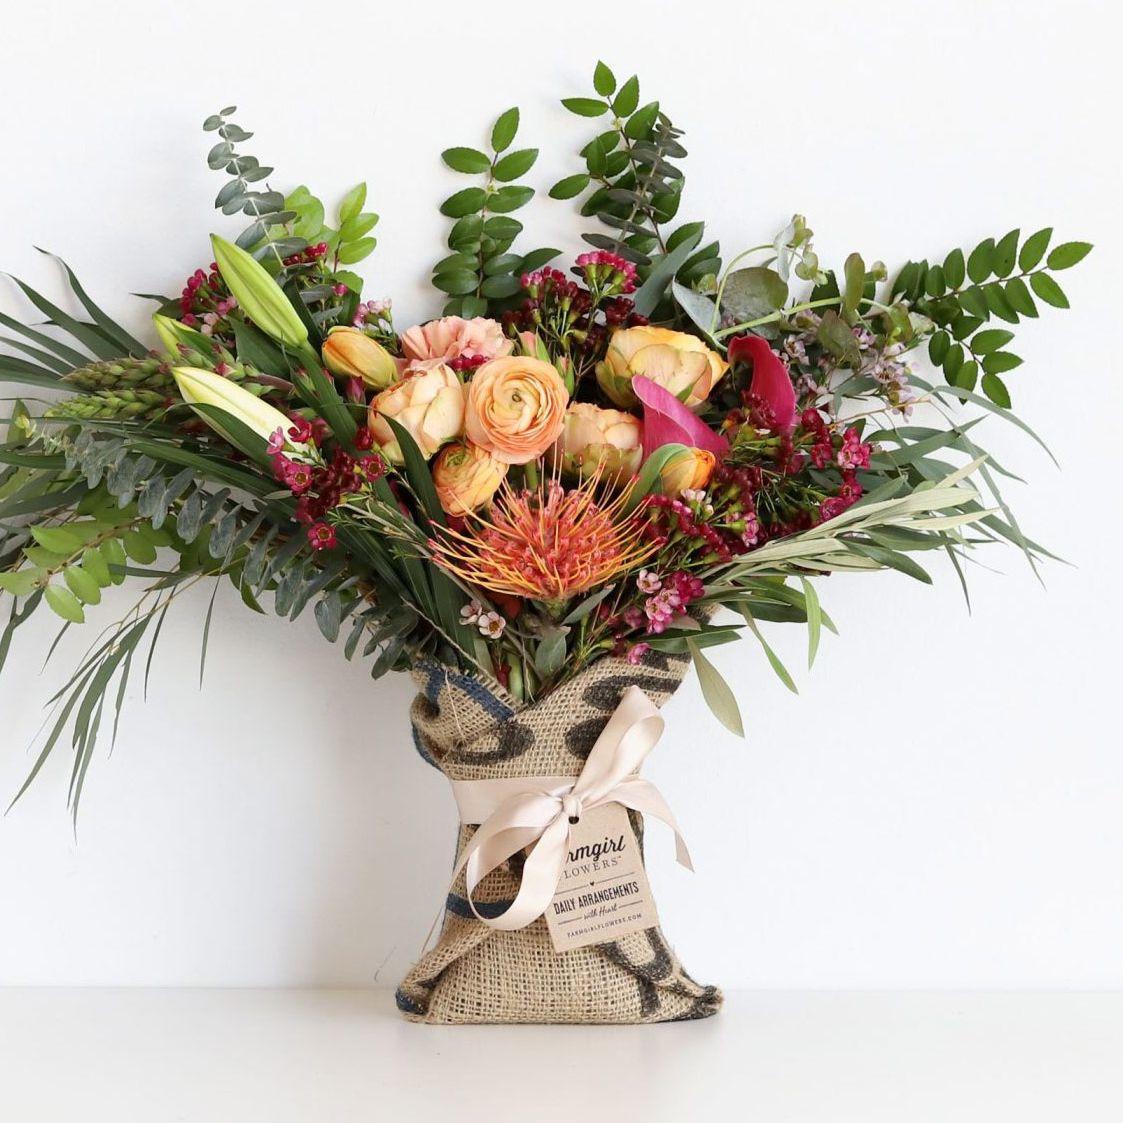 20 Best 4 Year Wedding Anniversary Gifts 2020 The Strategist New York Magazine